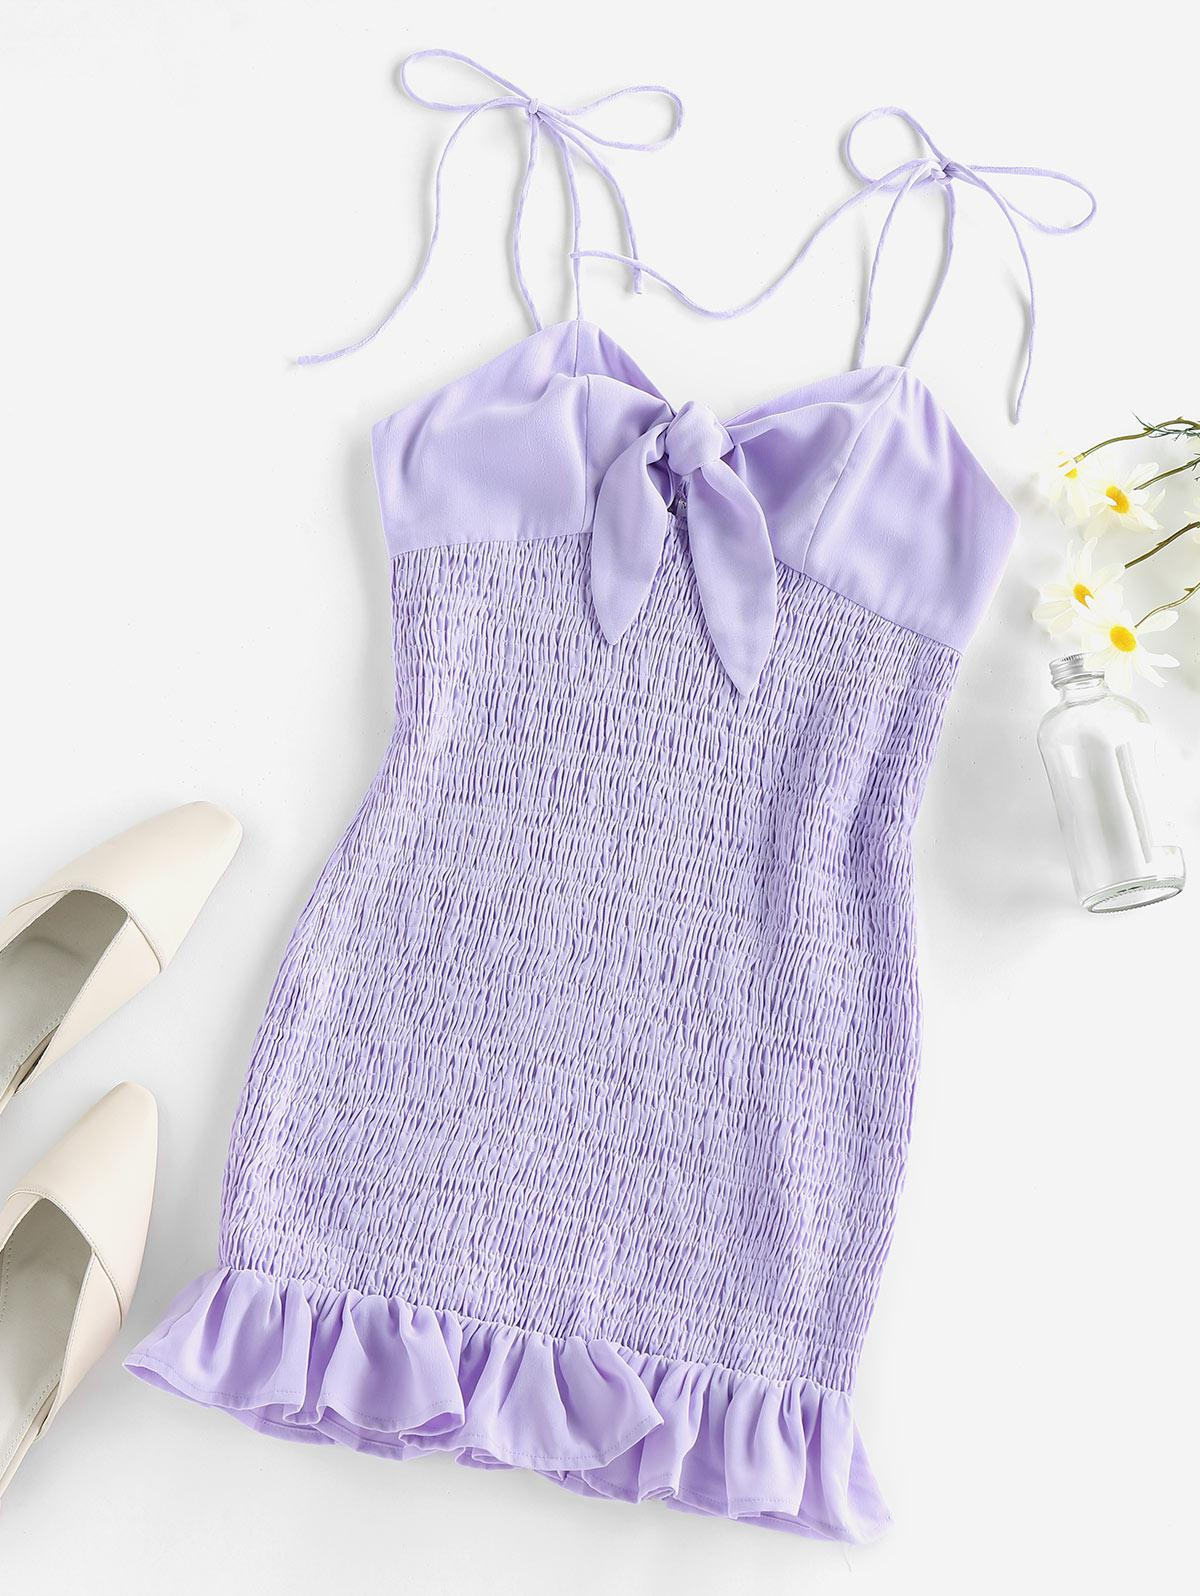 ZAFUL Tie Knot Ruffle Smocked Dress